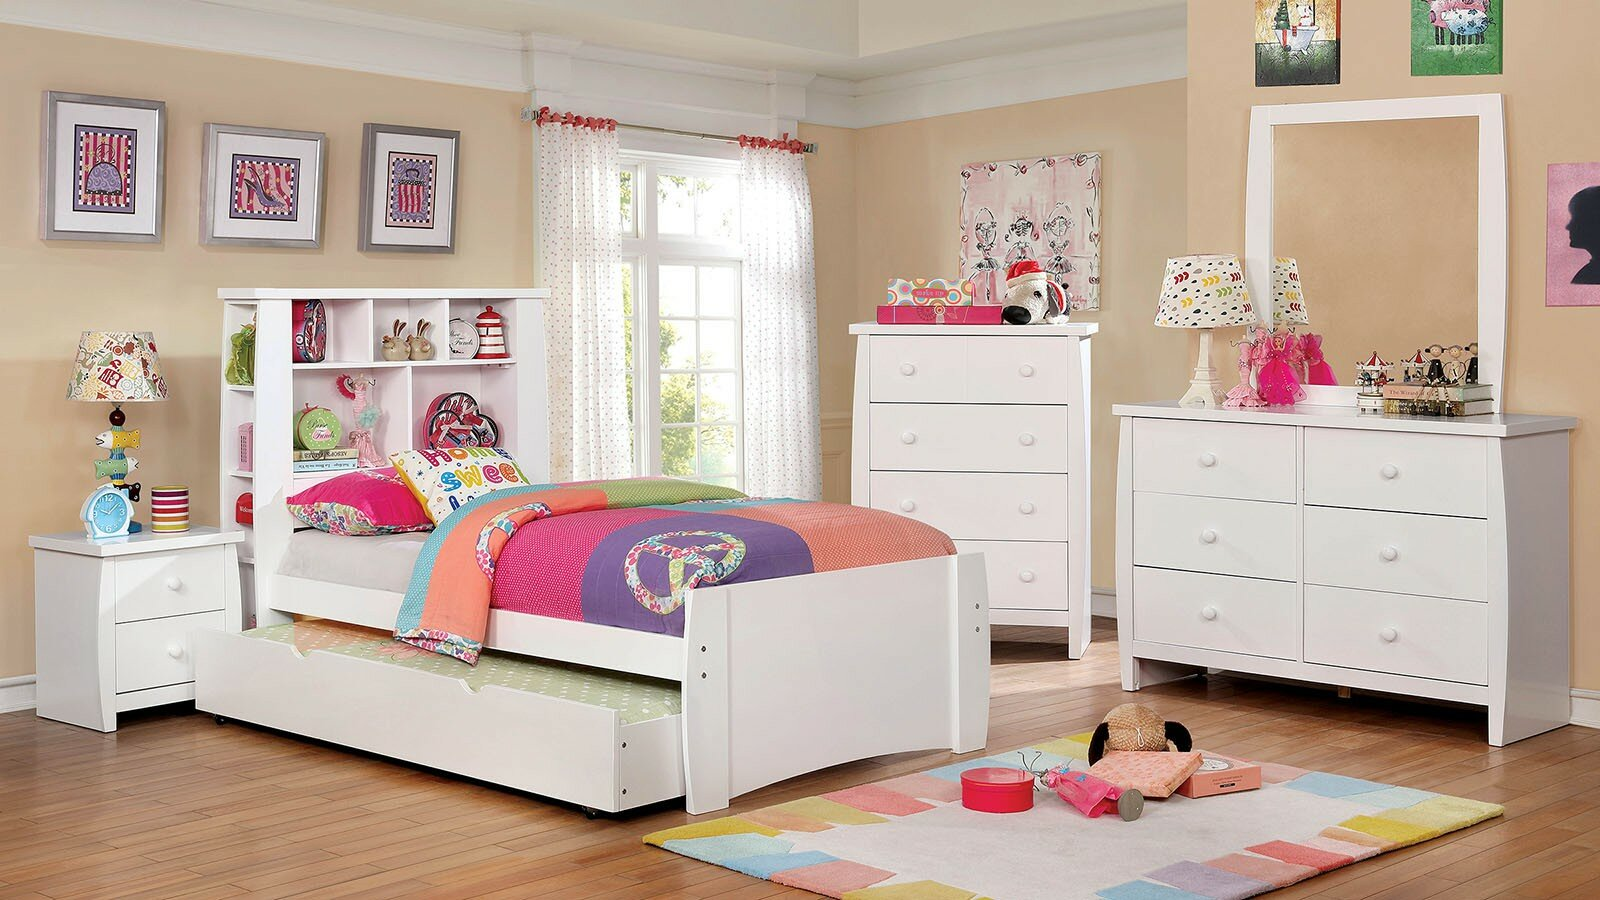 BIG SALE] Our Best Kids Bedroom Sets You'll Love In 2020 | Wayfair